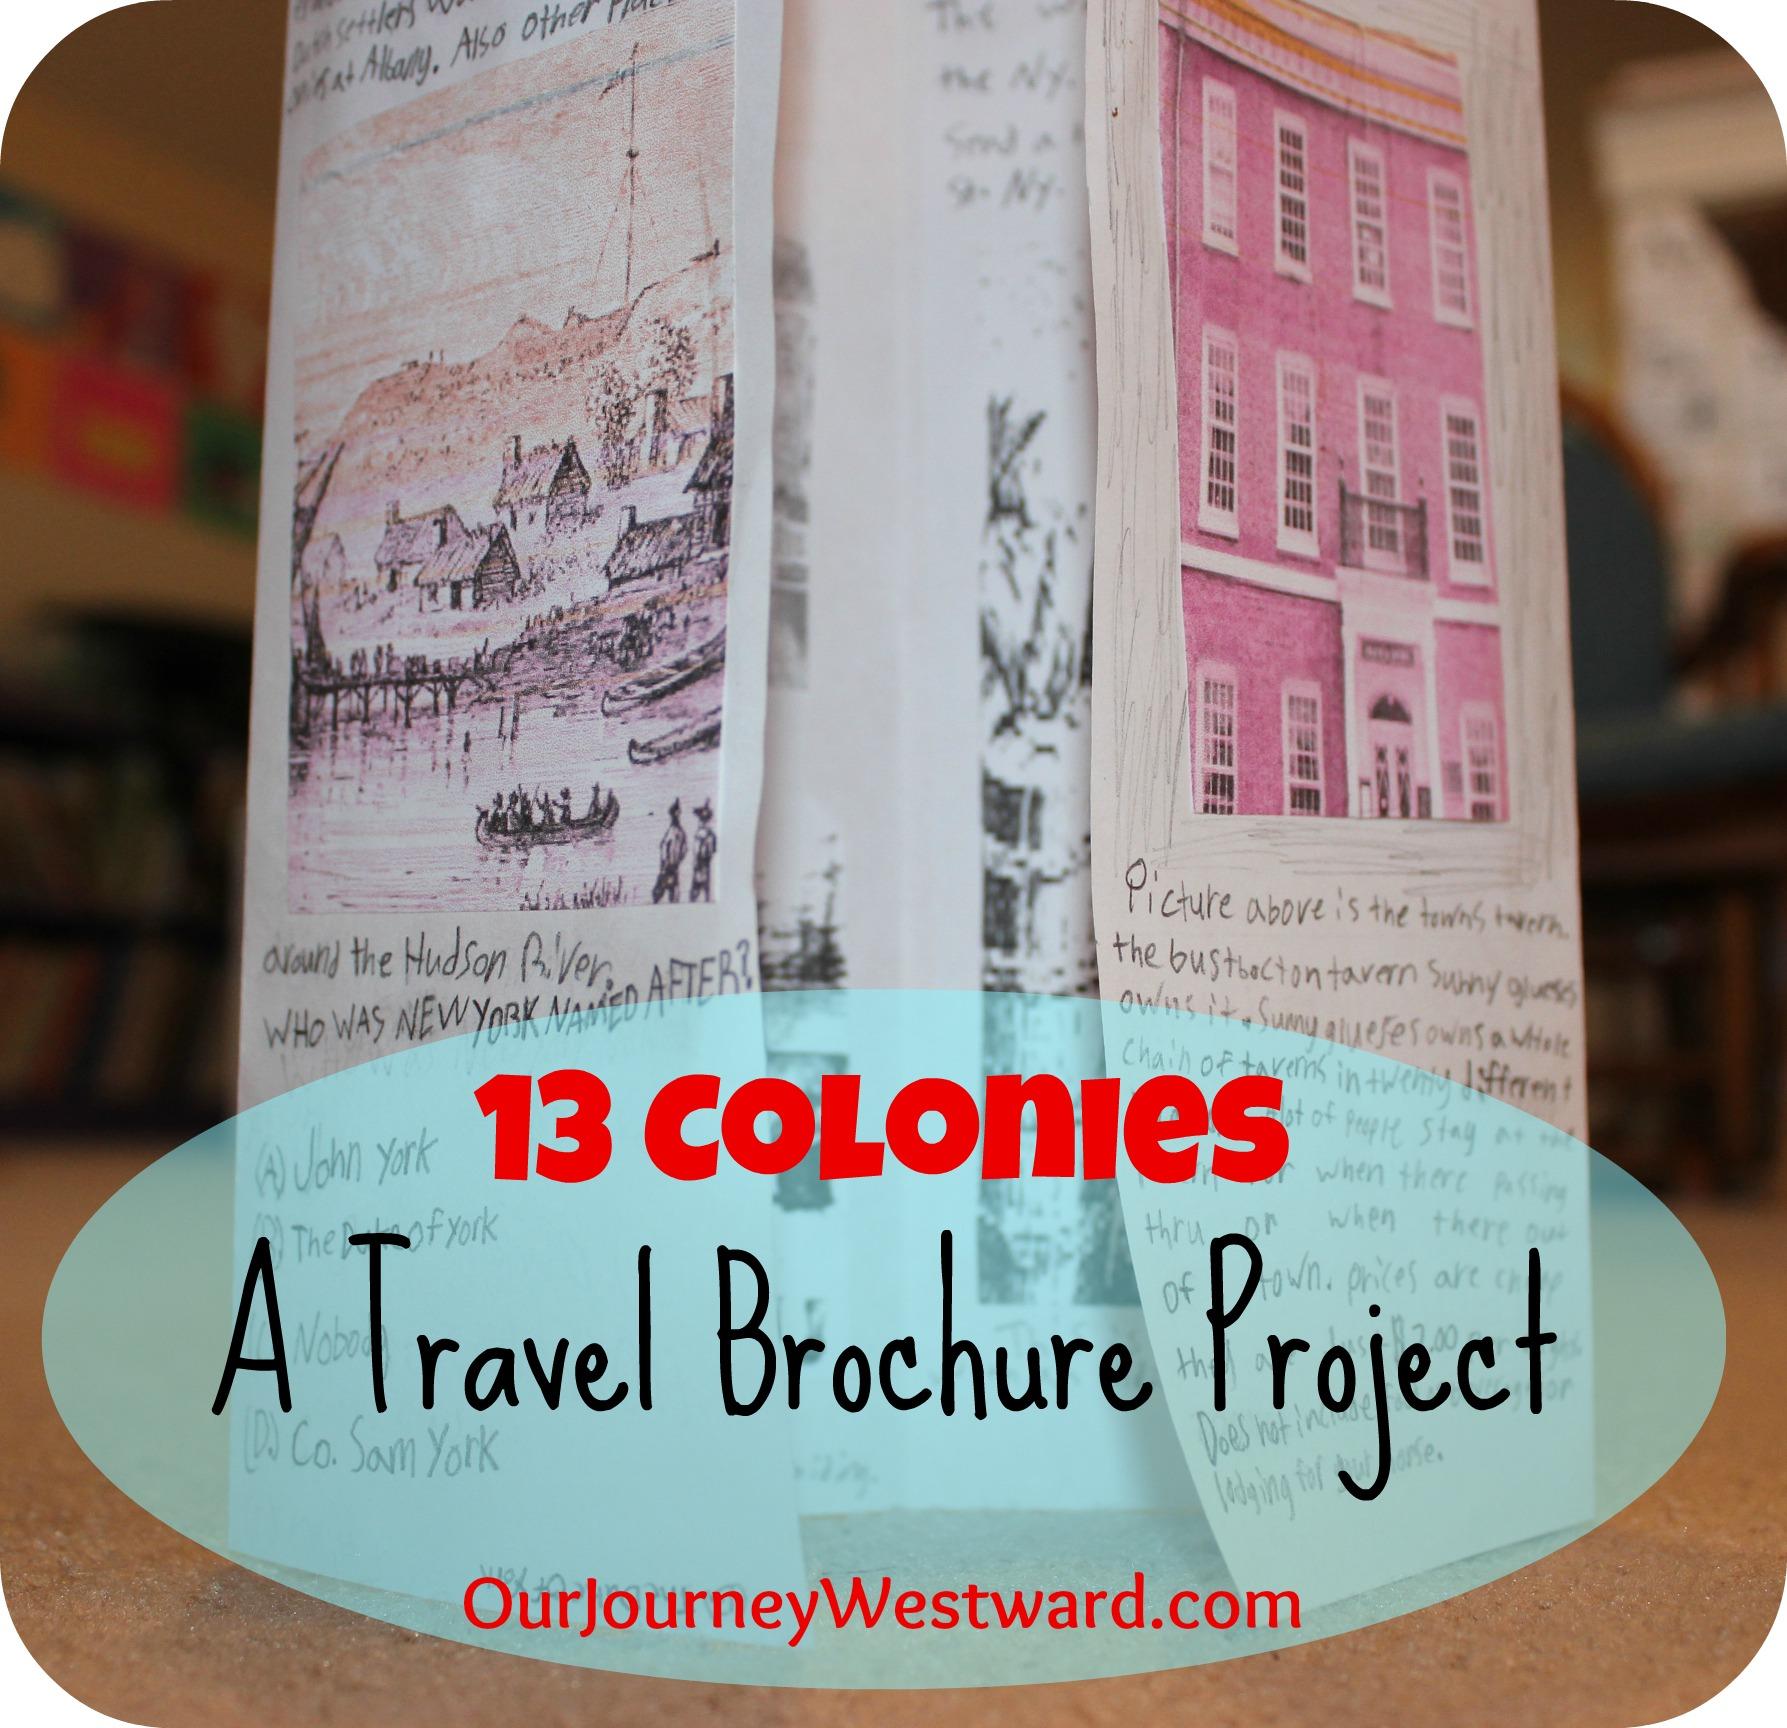 13 Colonies Travel Brochure Our Journey Westward